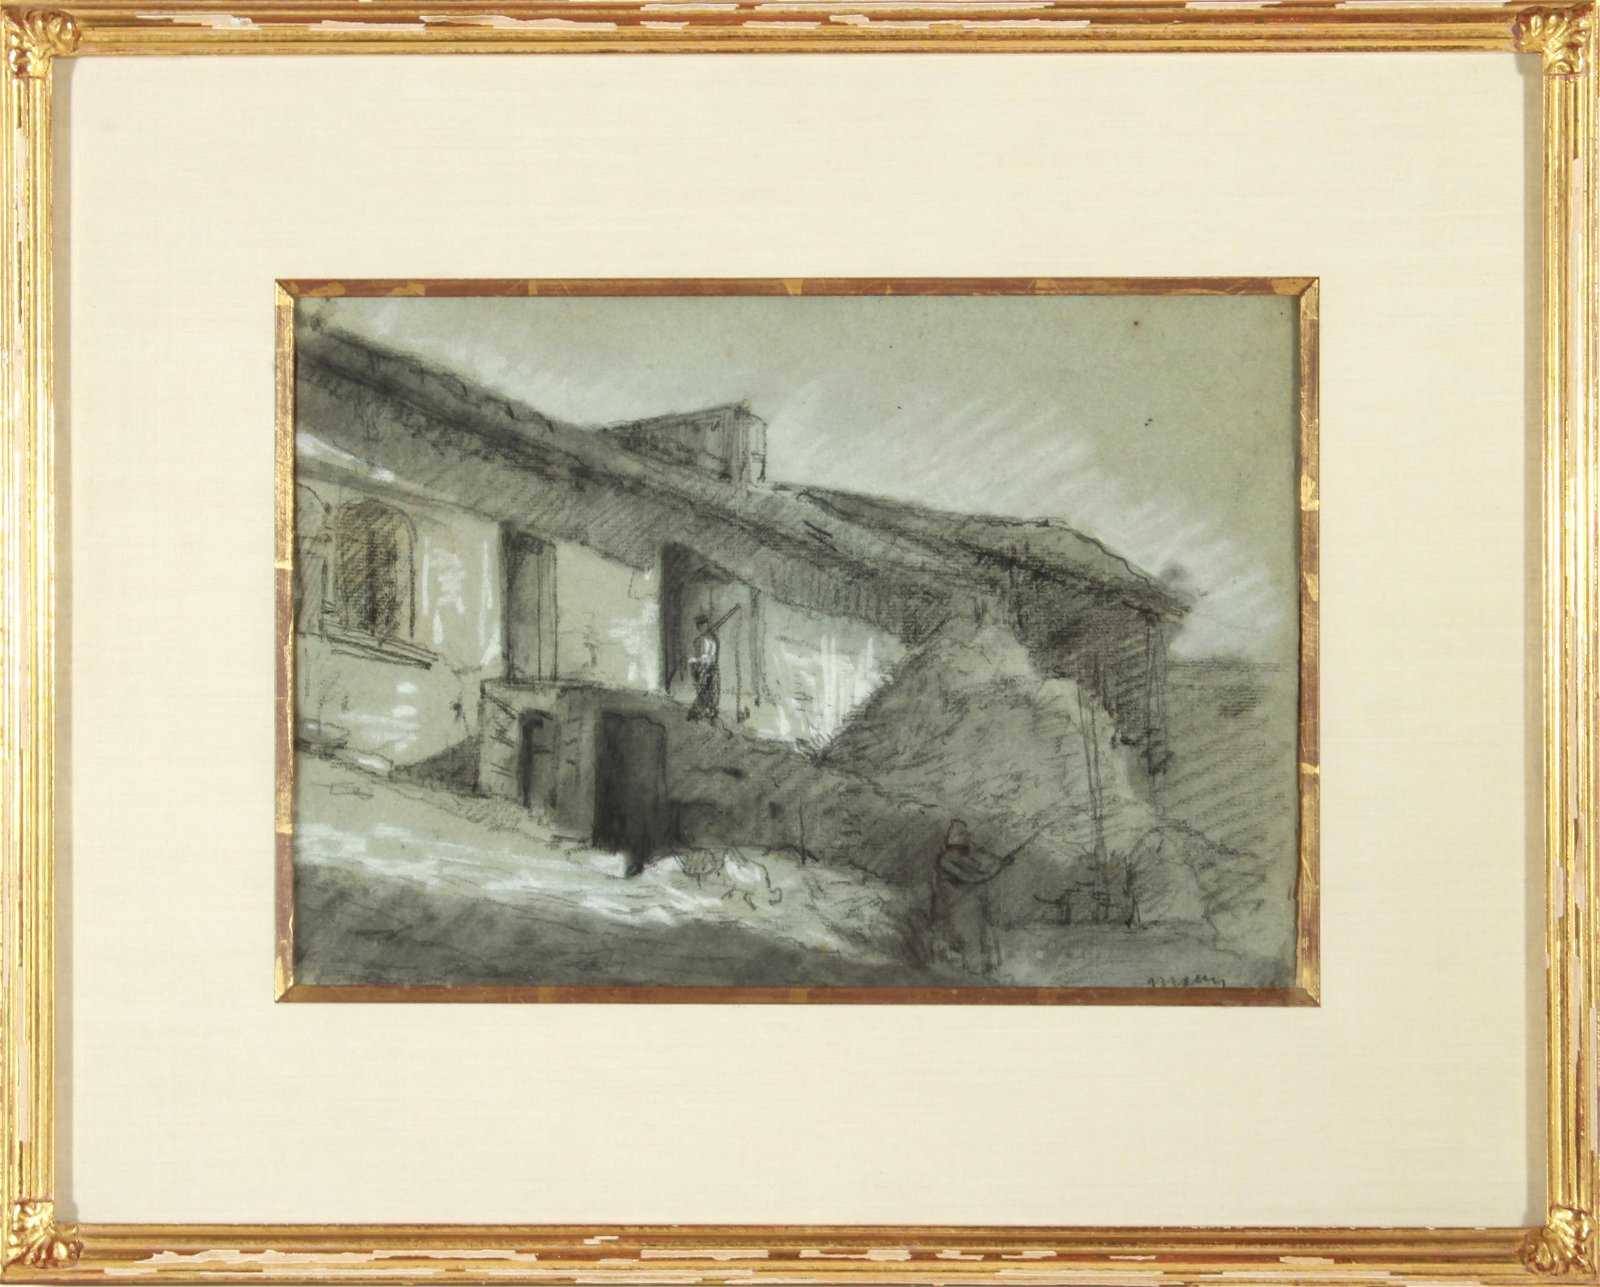 Charles Maurin Farm House Charcoal & Chalk Drawing